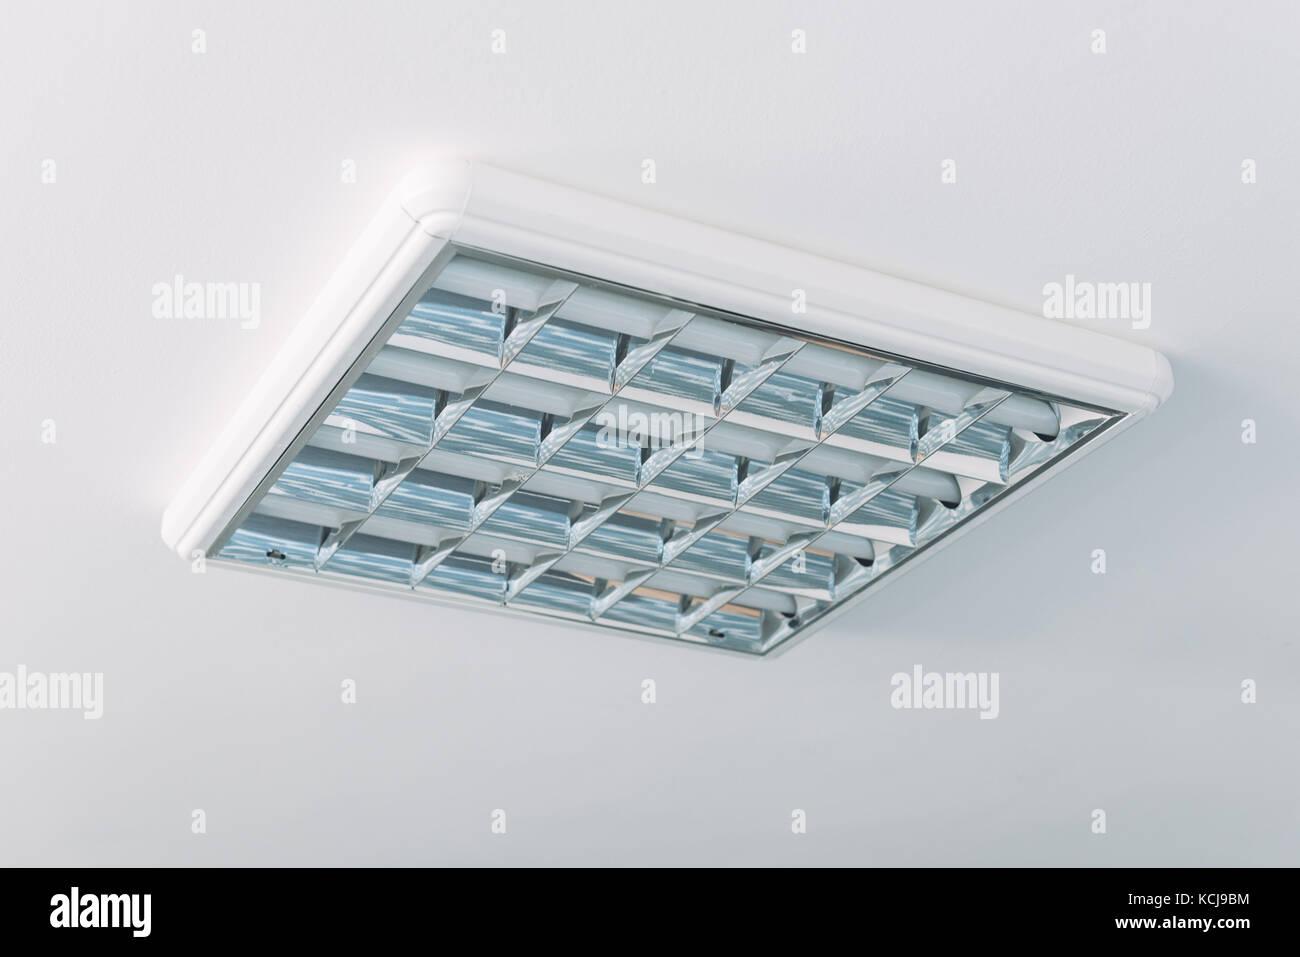 Fluorescent Ceiling Lights Stock Photos & Fluorescent Ceiling Lights ...